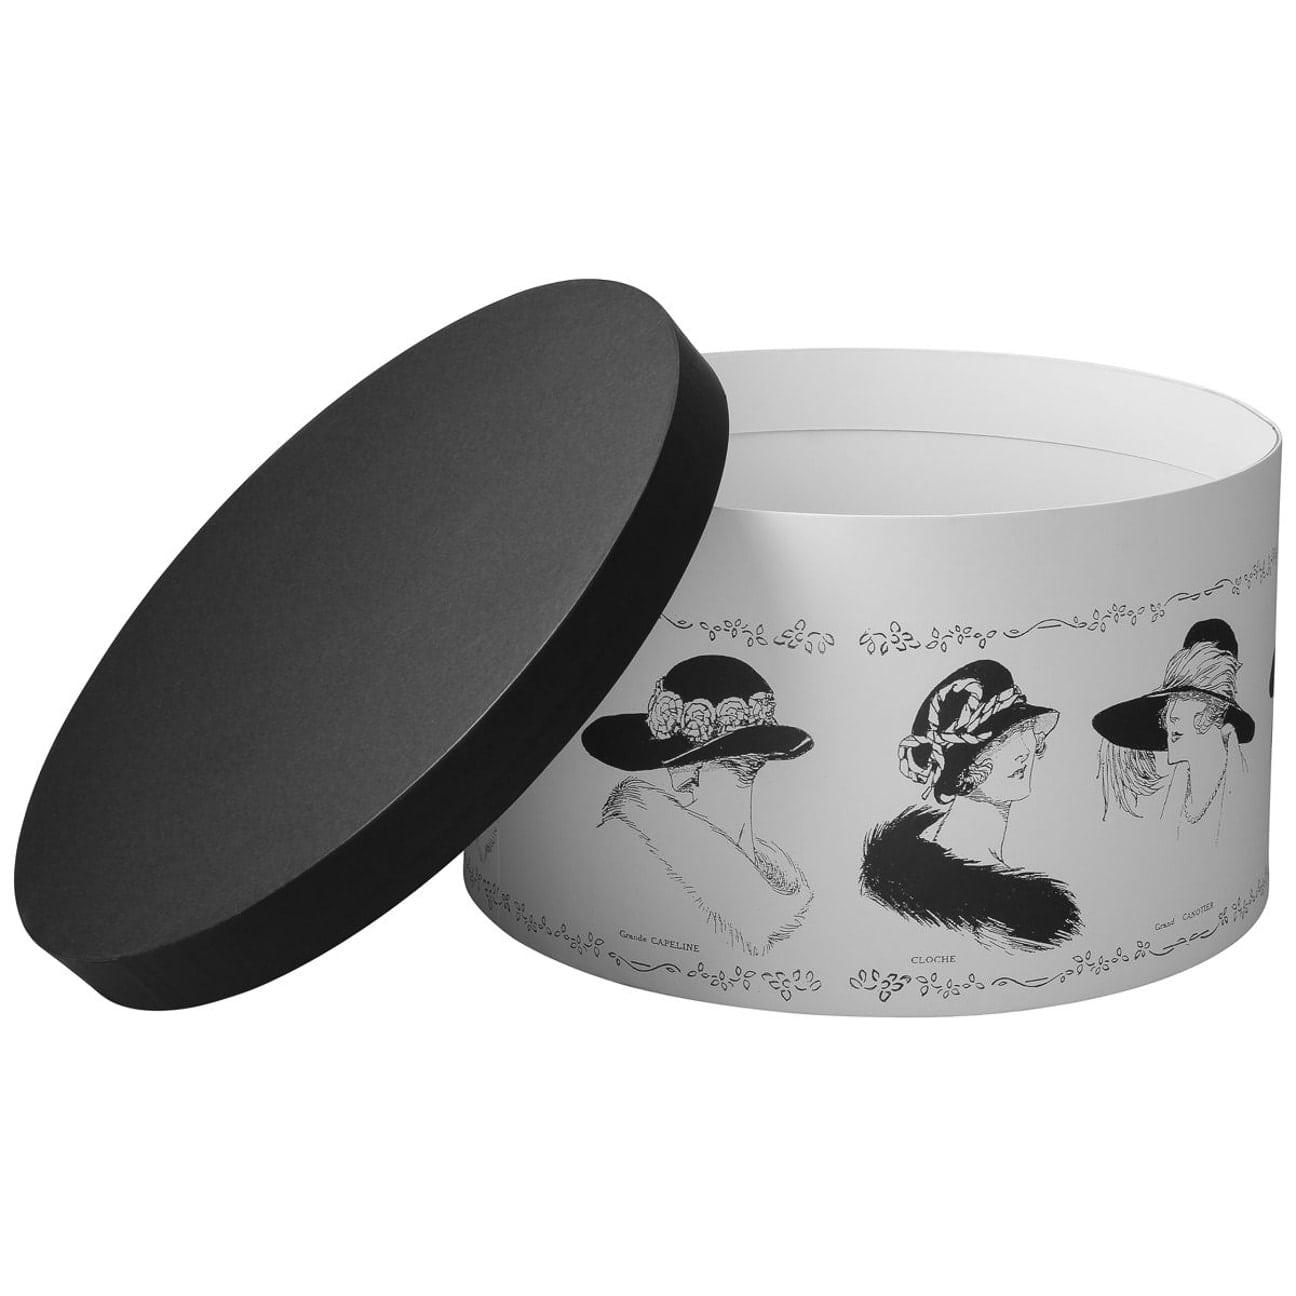 Caja Sombrero Portrait 41 cm by McBURN - Sombreros - sombreroshop.es 52162e8f7ff